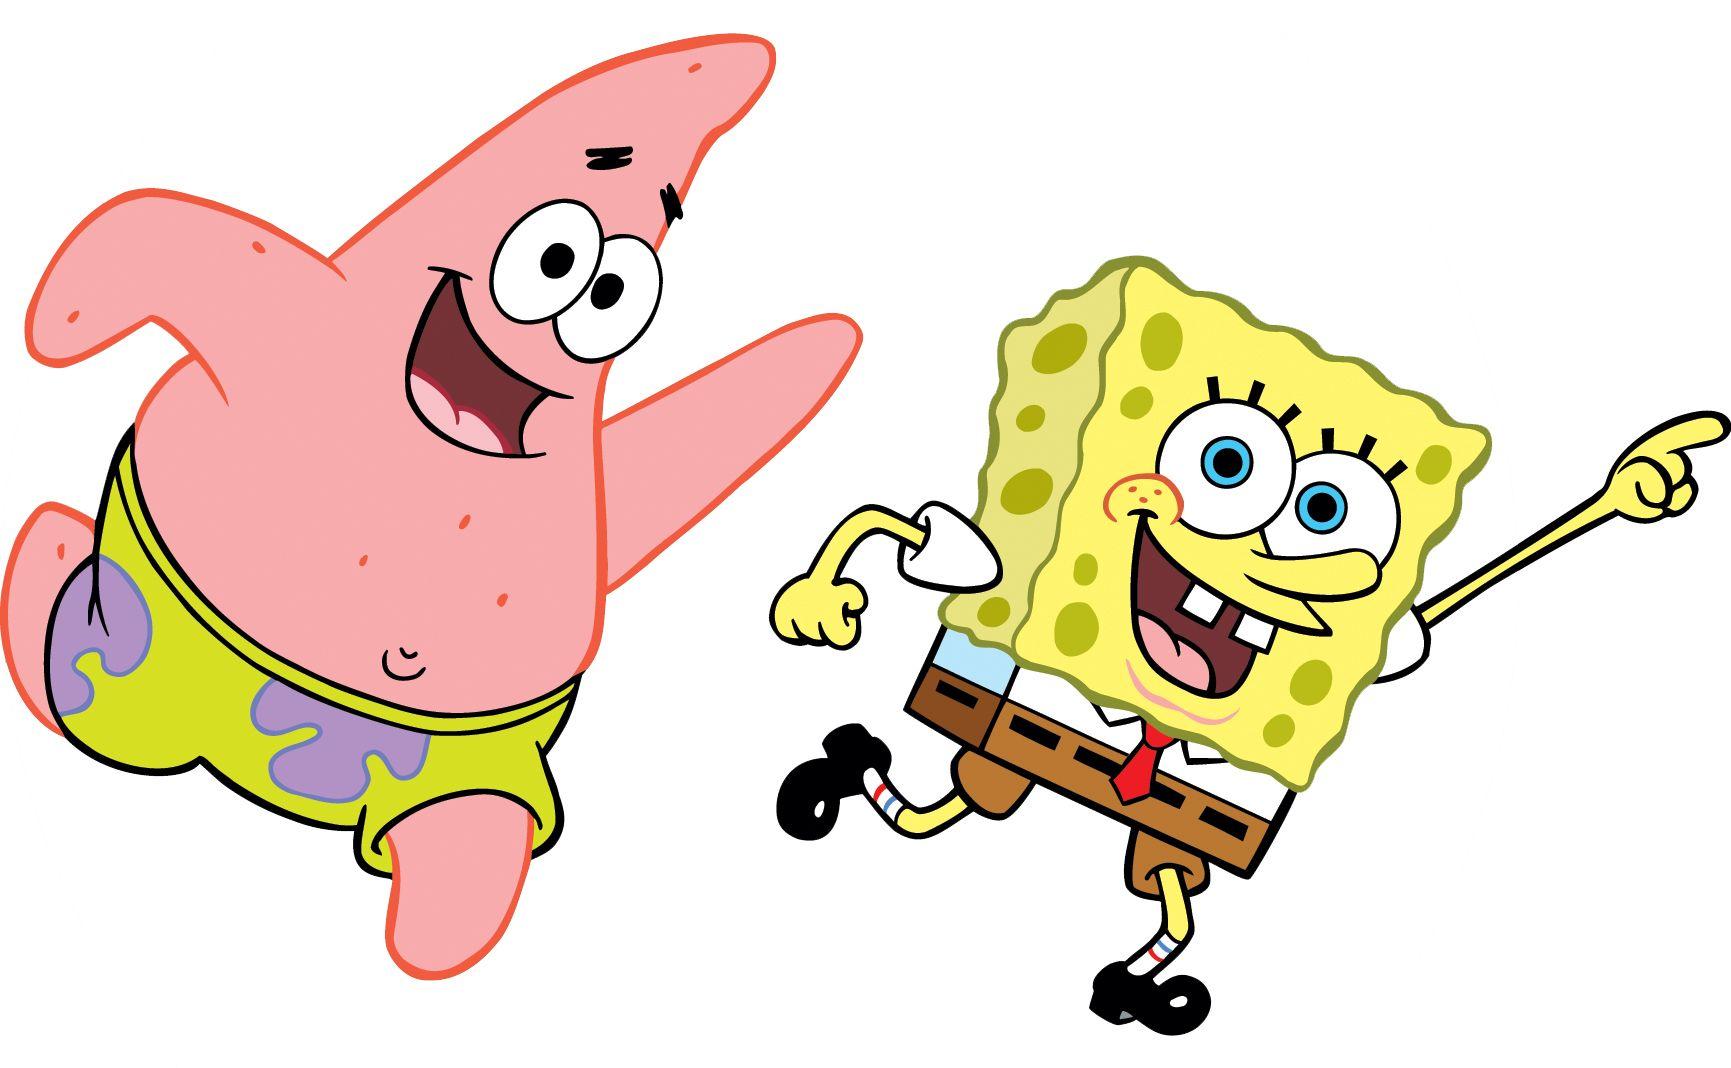 Spongebob Squarepants Photo Spongebob Patrick Spongebob Patrick Spongebob Wallpaper Spongebob Pics